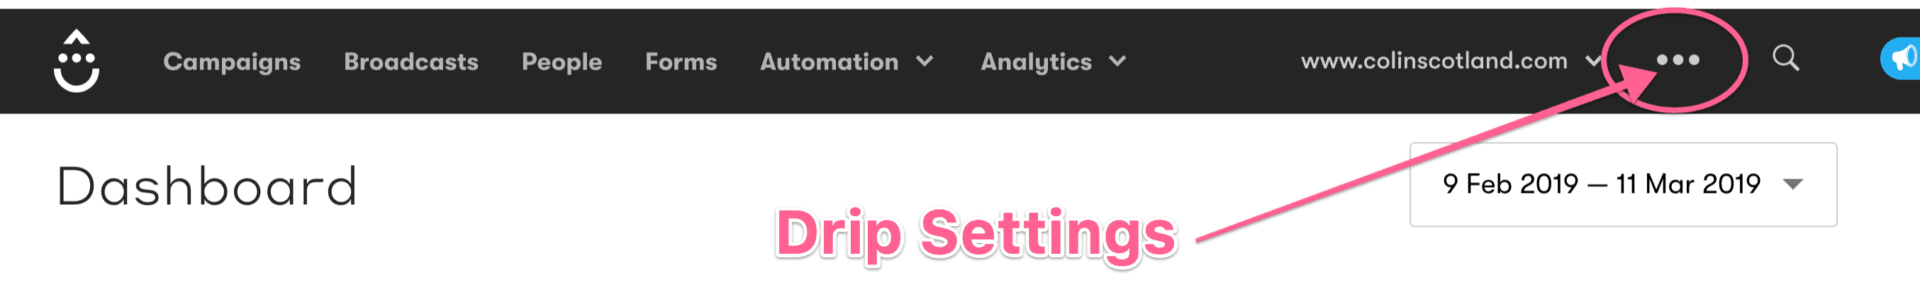 Drip Dashboard Settings Menu